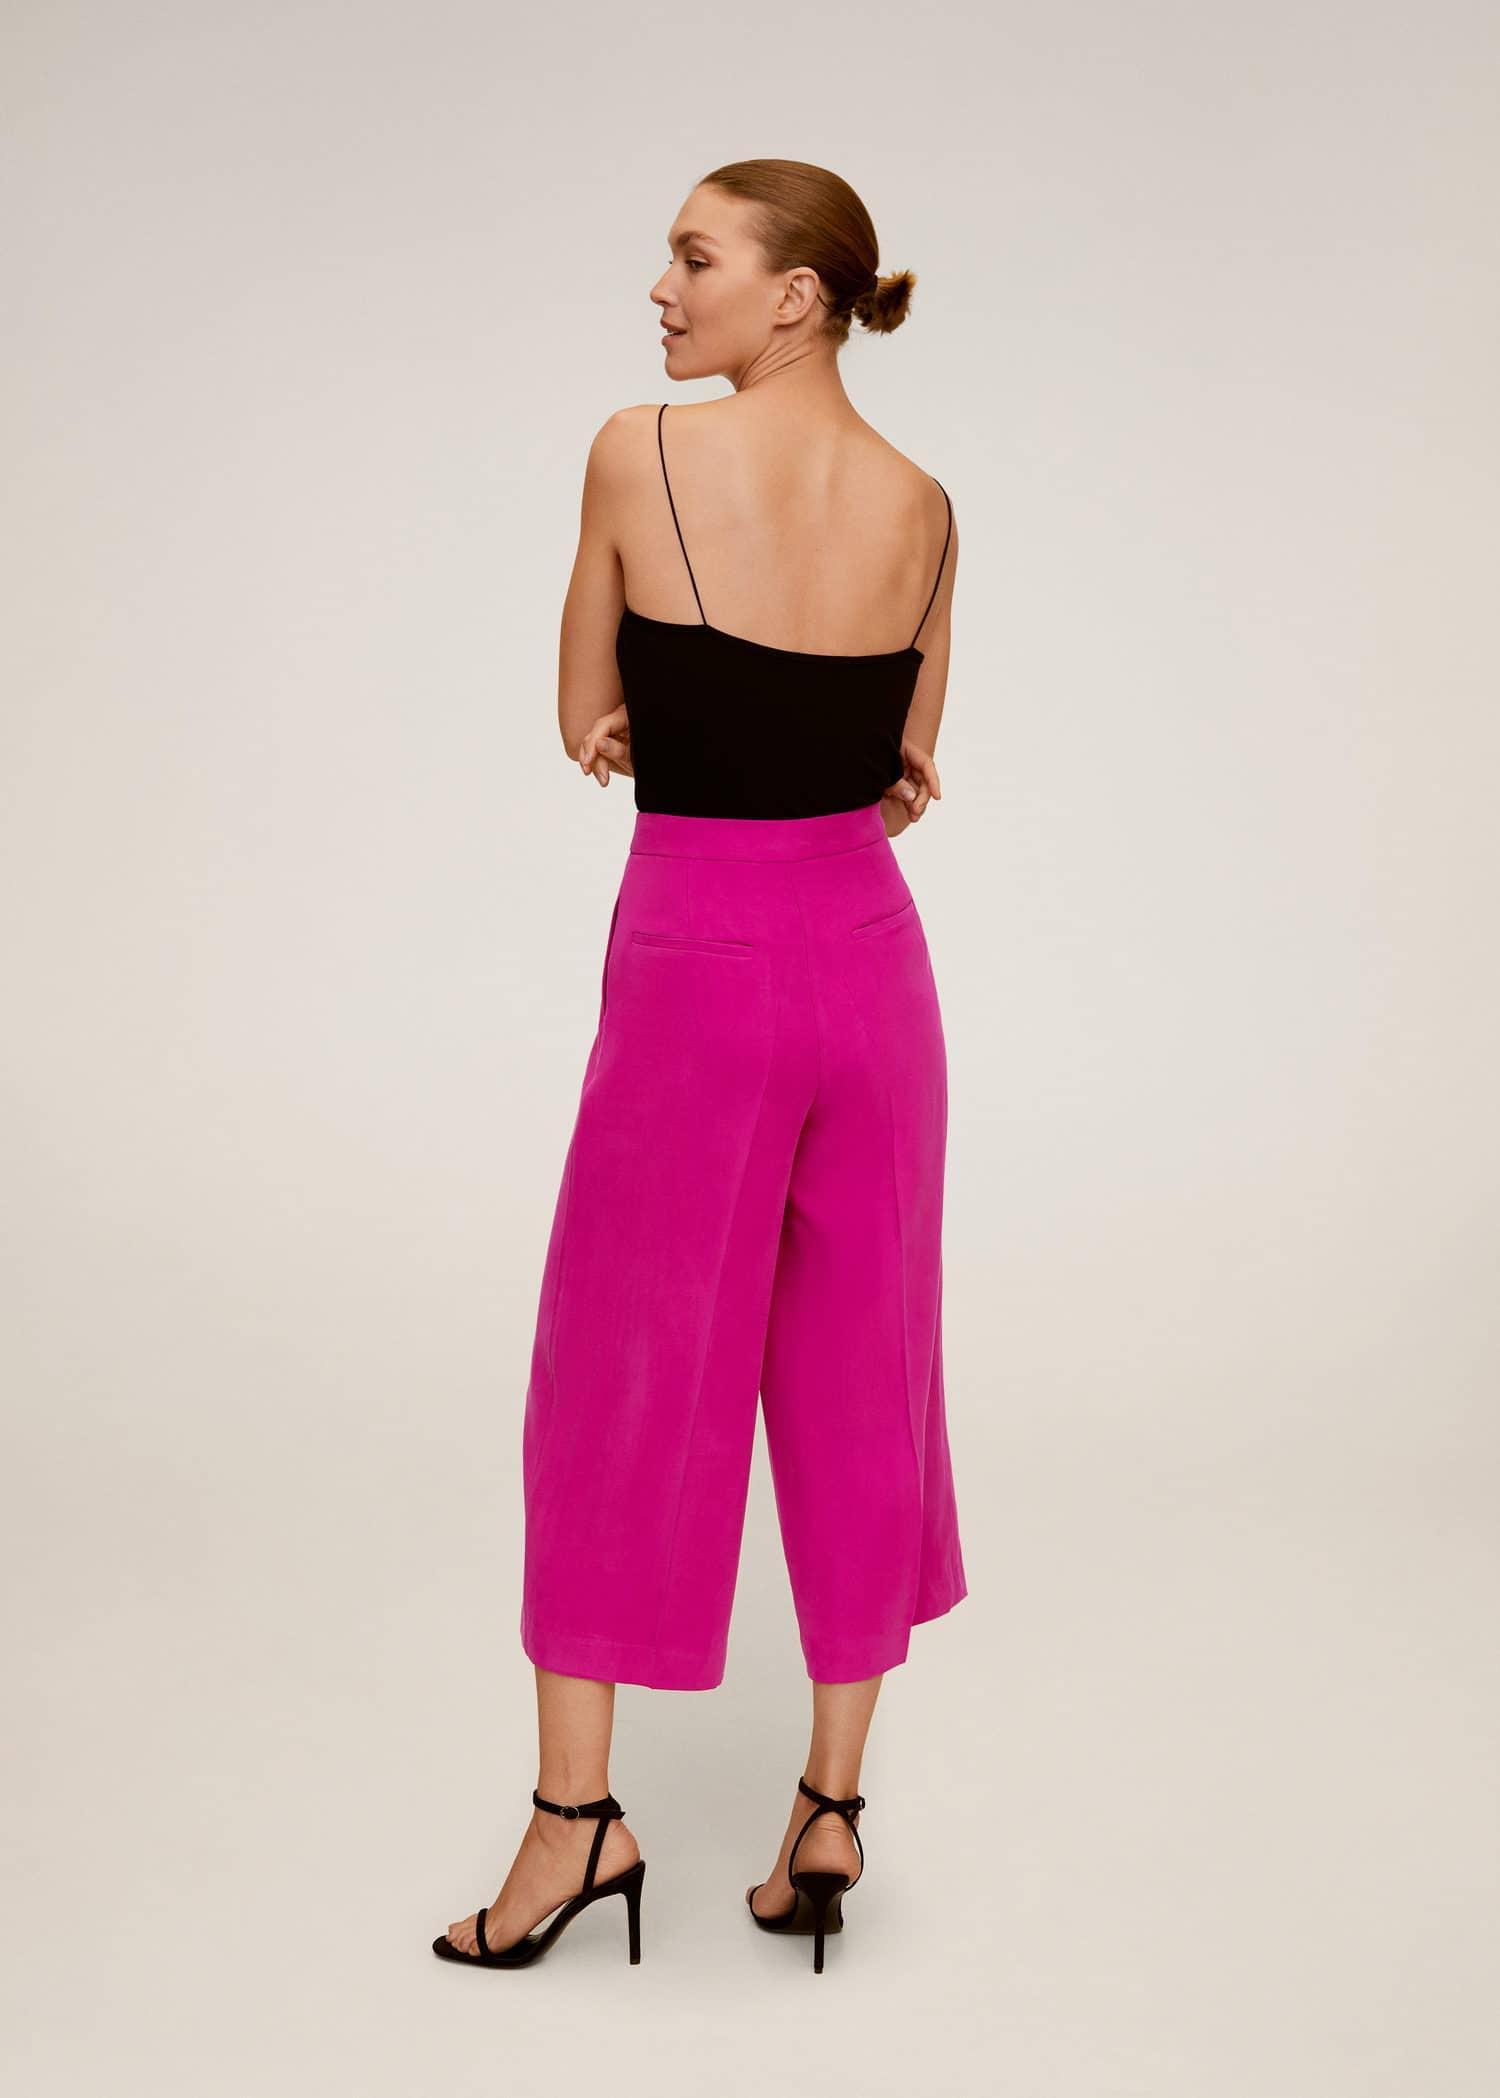 Pantalones Prendas Mujer Outlet Espana